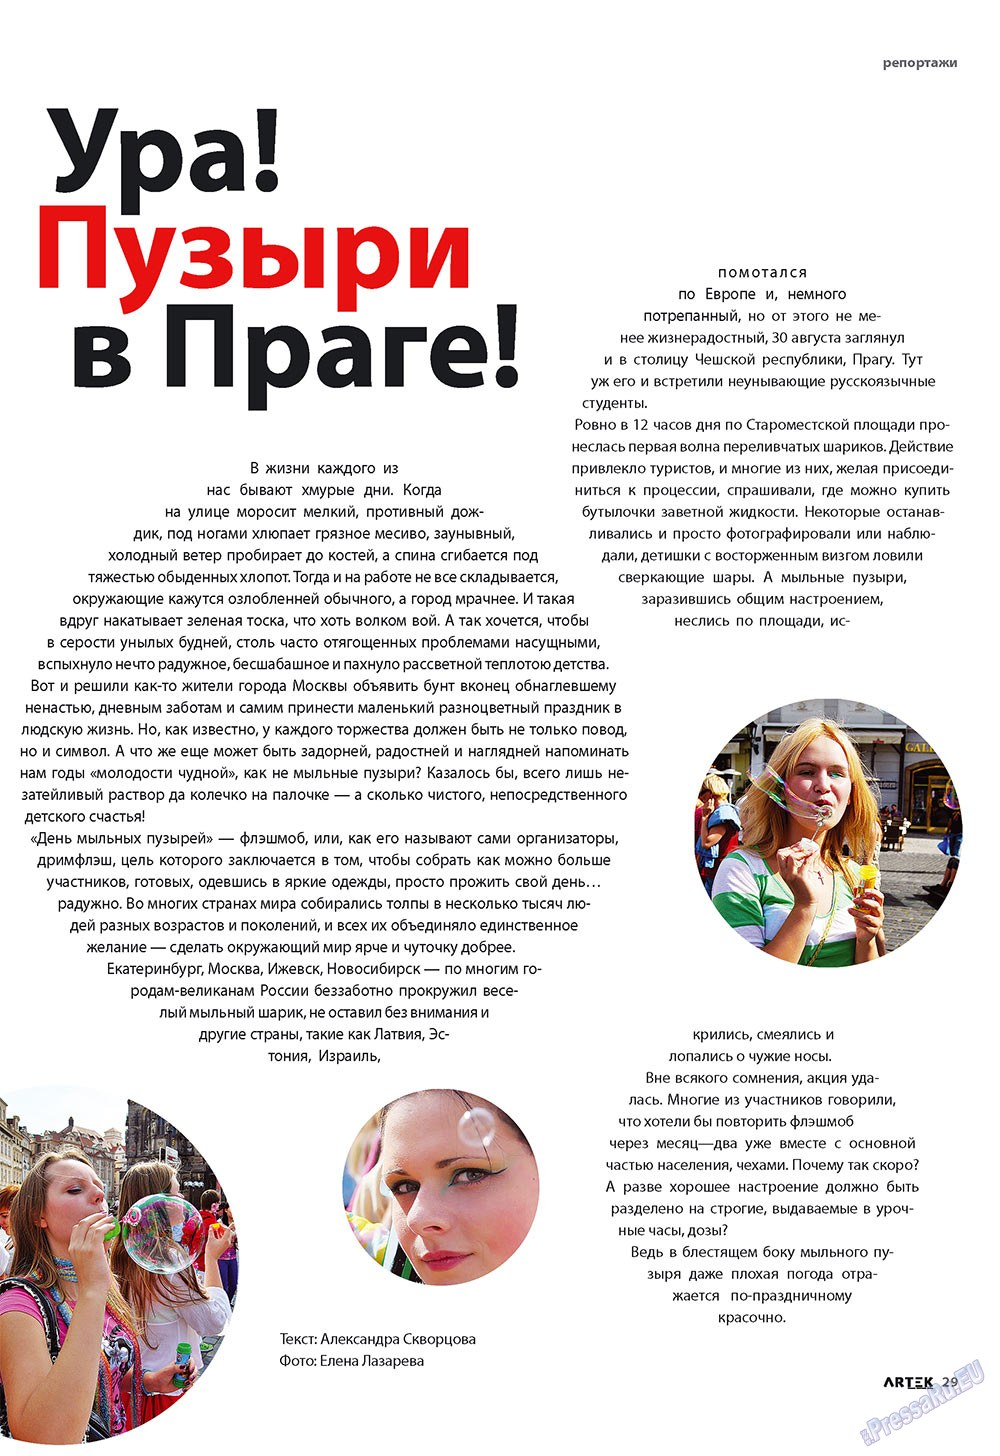 Артек (журнал). 2009 год, номер 4, стр. 29